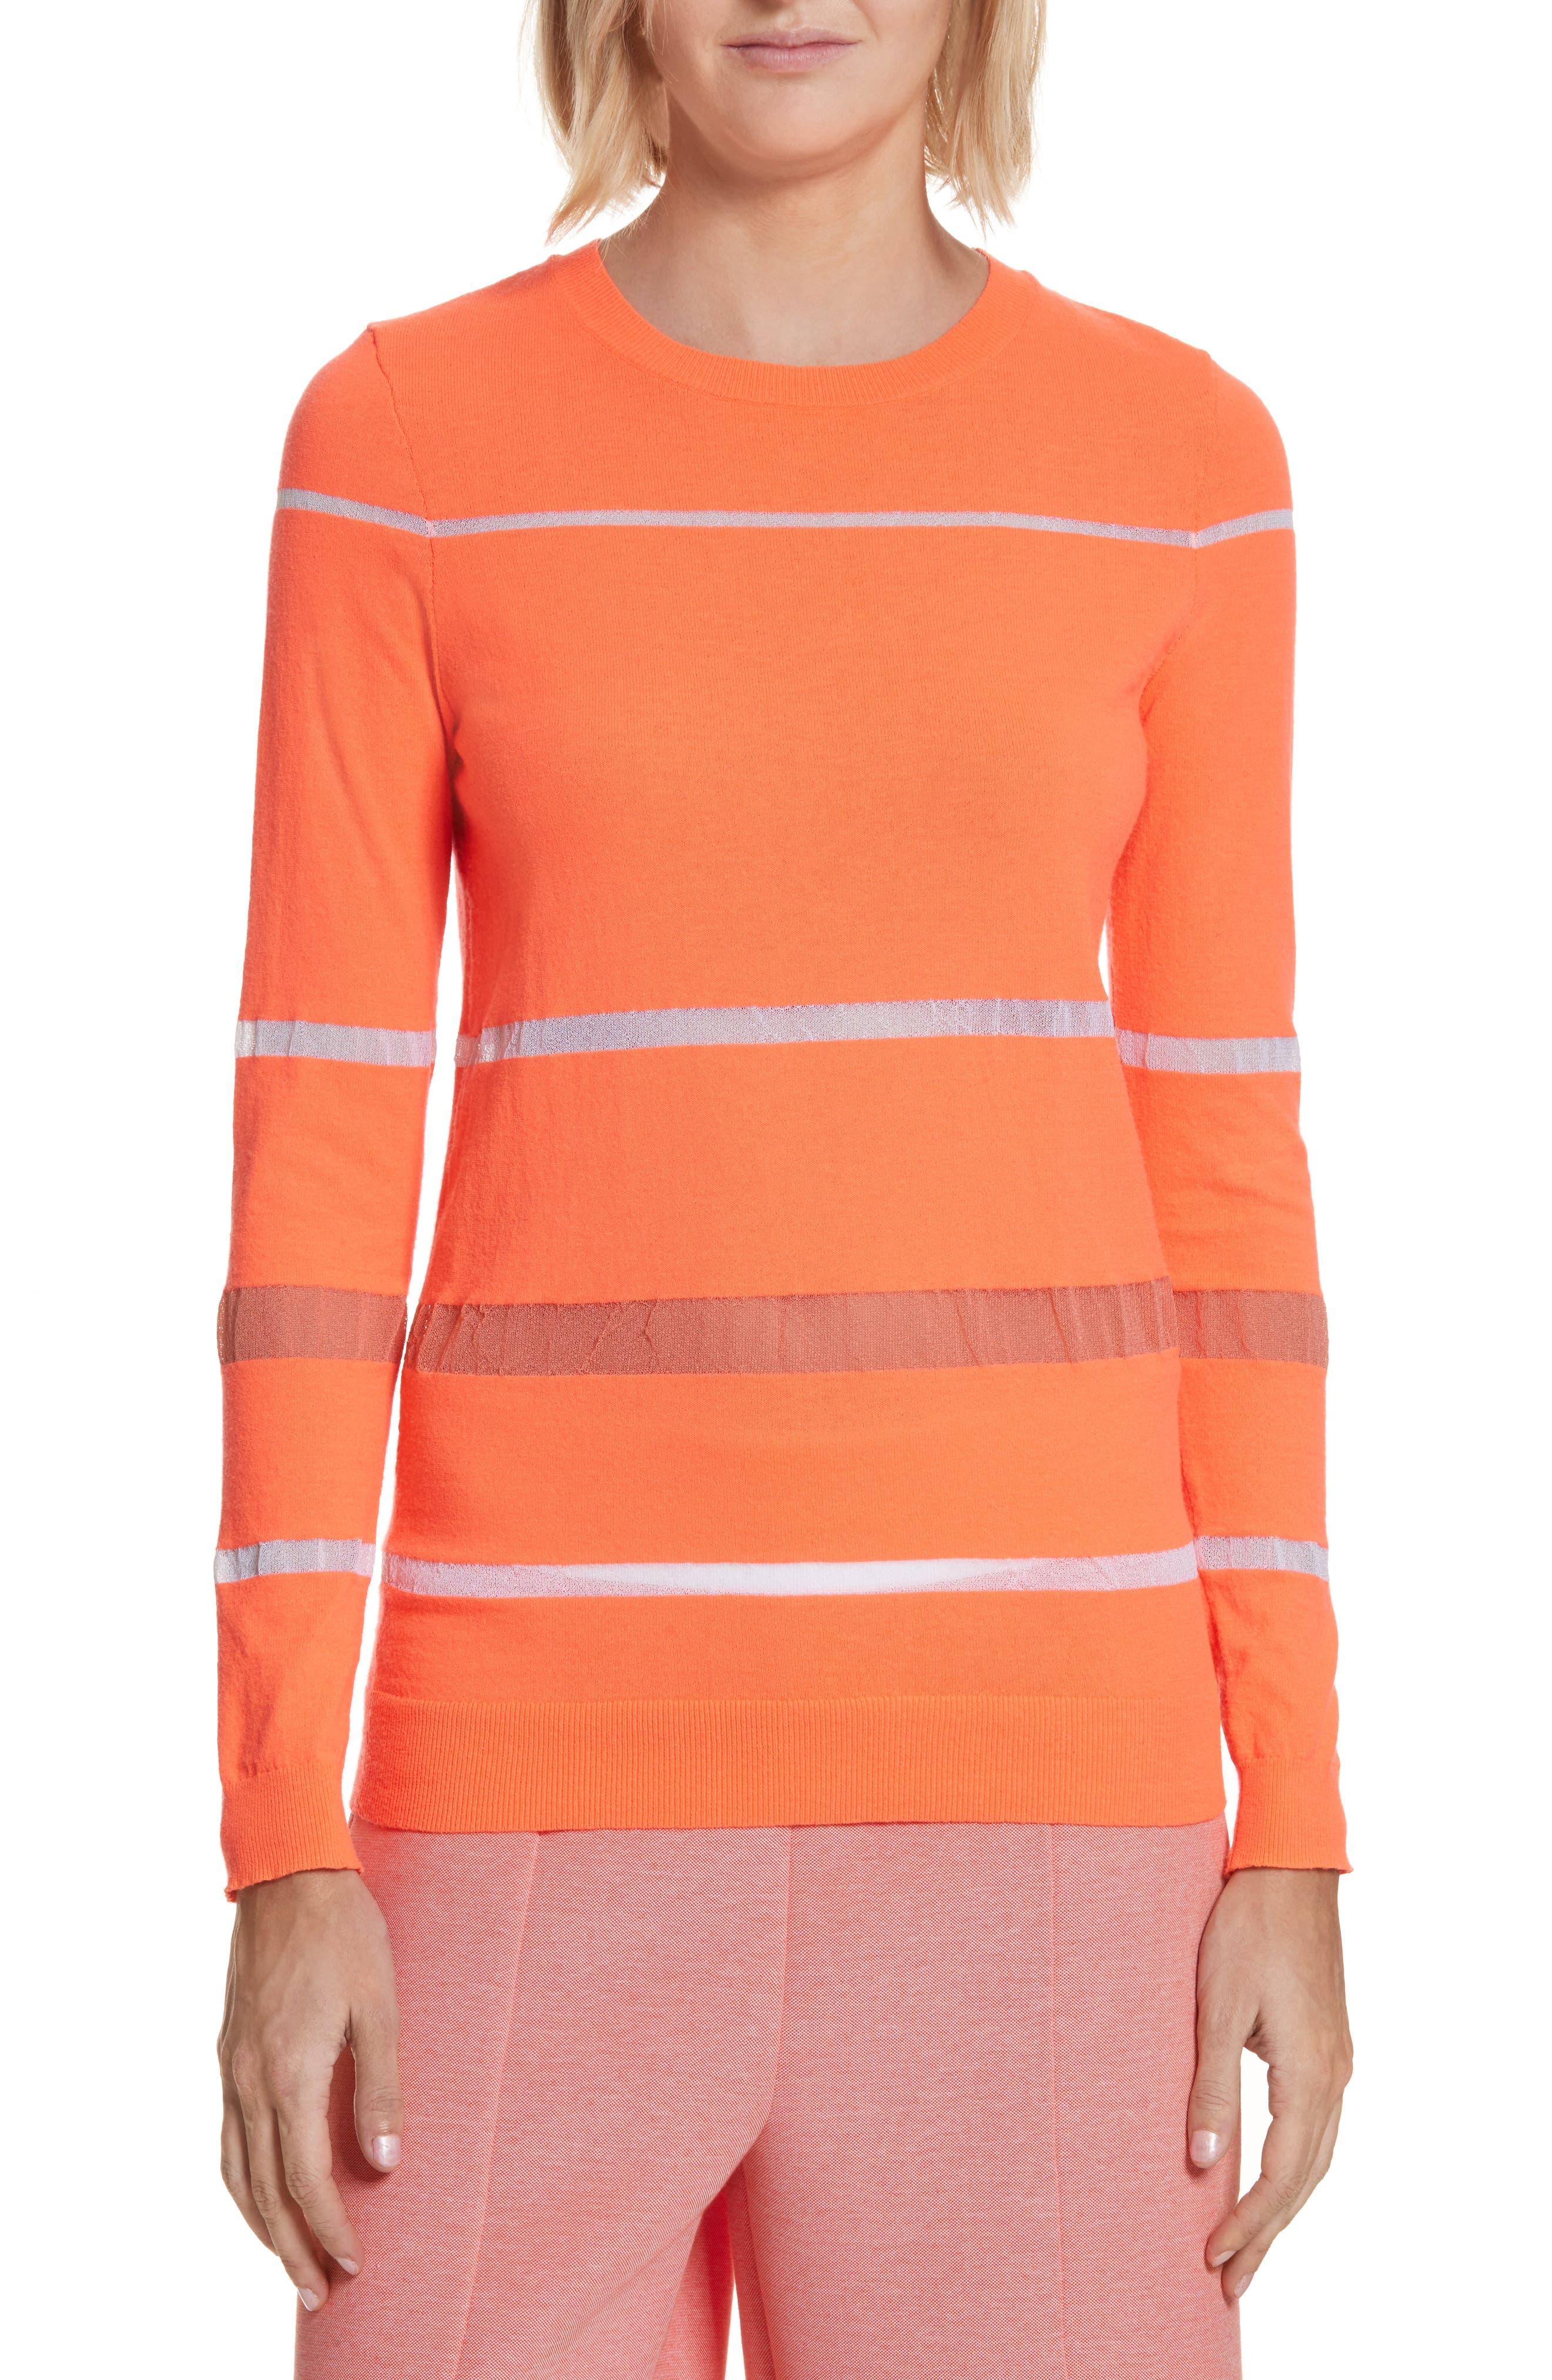 Alternate Image 1 Selected - Neverbefore Illusion Stripe Crewneck Sweater